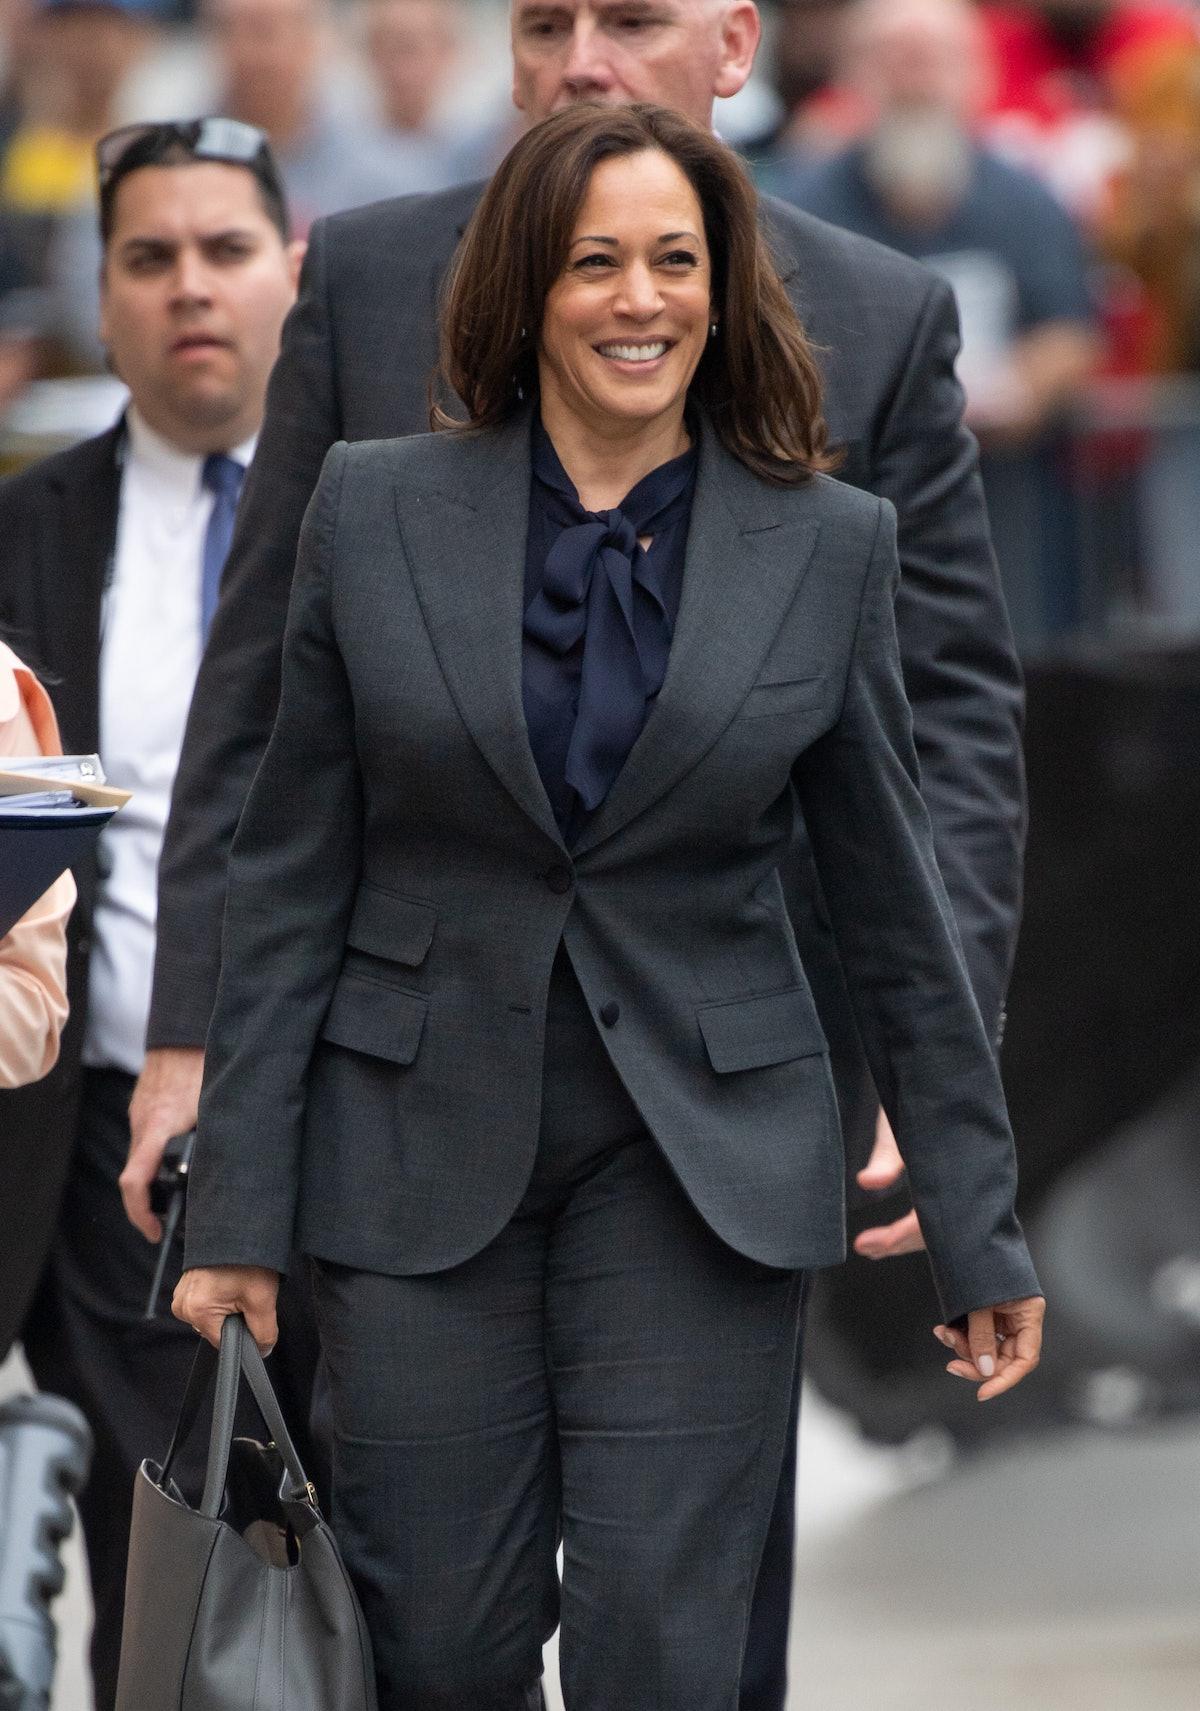 LOS ANGELES, CA - MARCH 19: Senator Kamala Harris is seen at 'Jimmy Kimmel Live' on March 19, 2019 i...